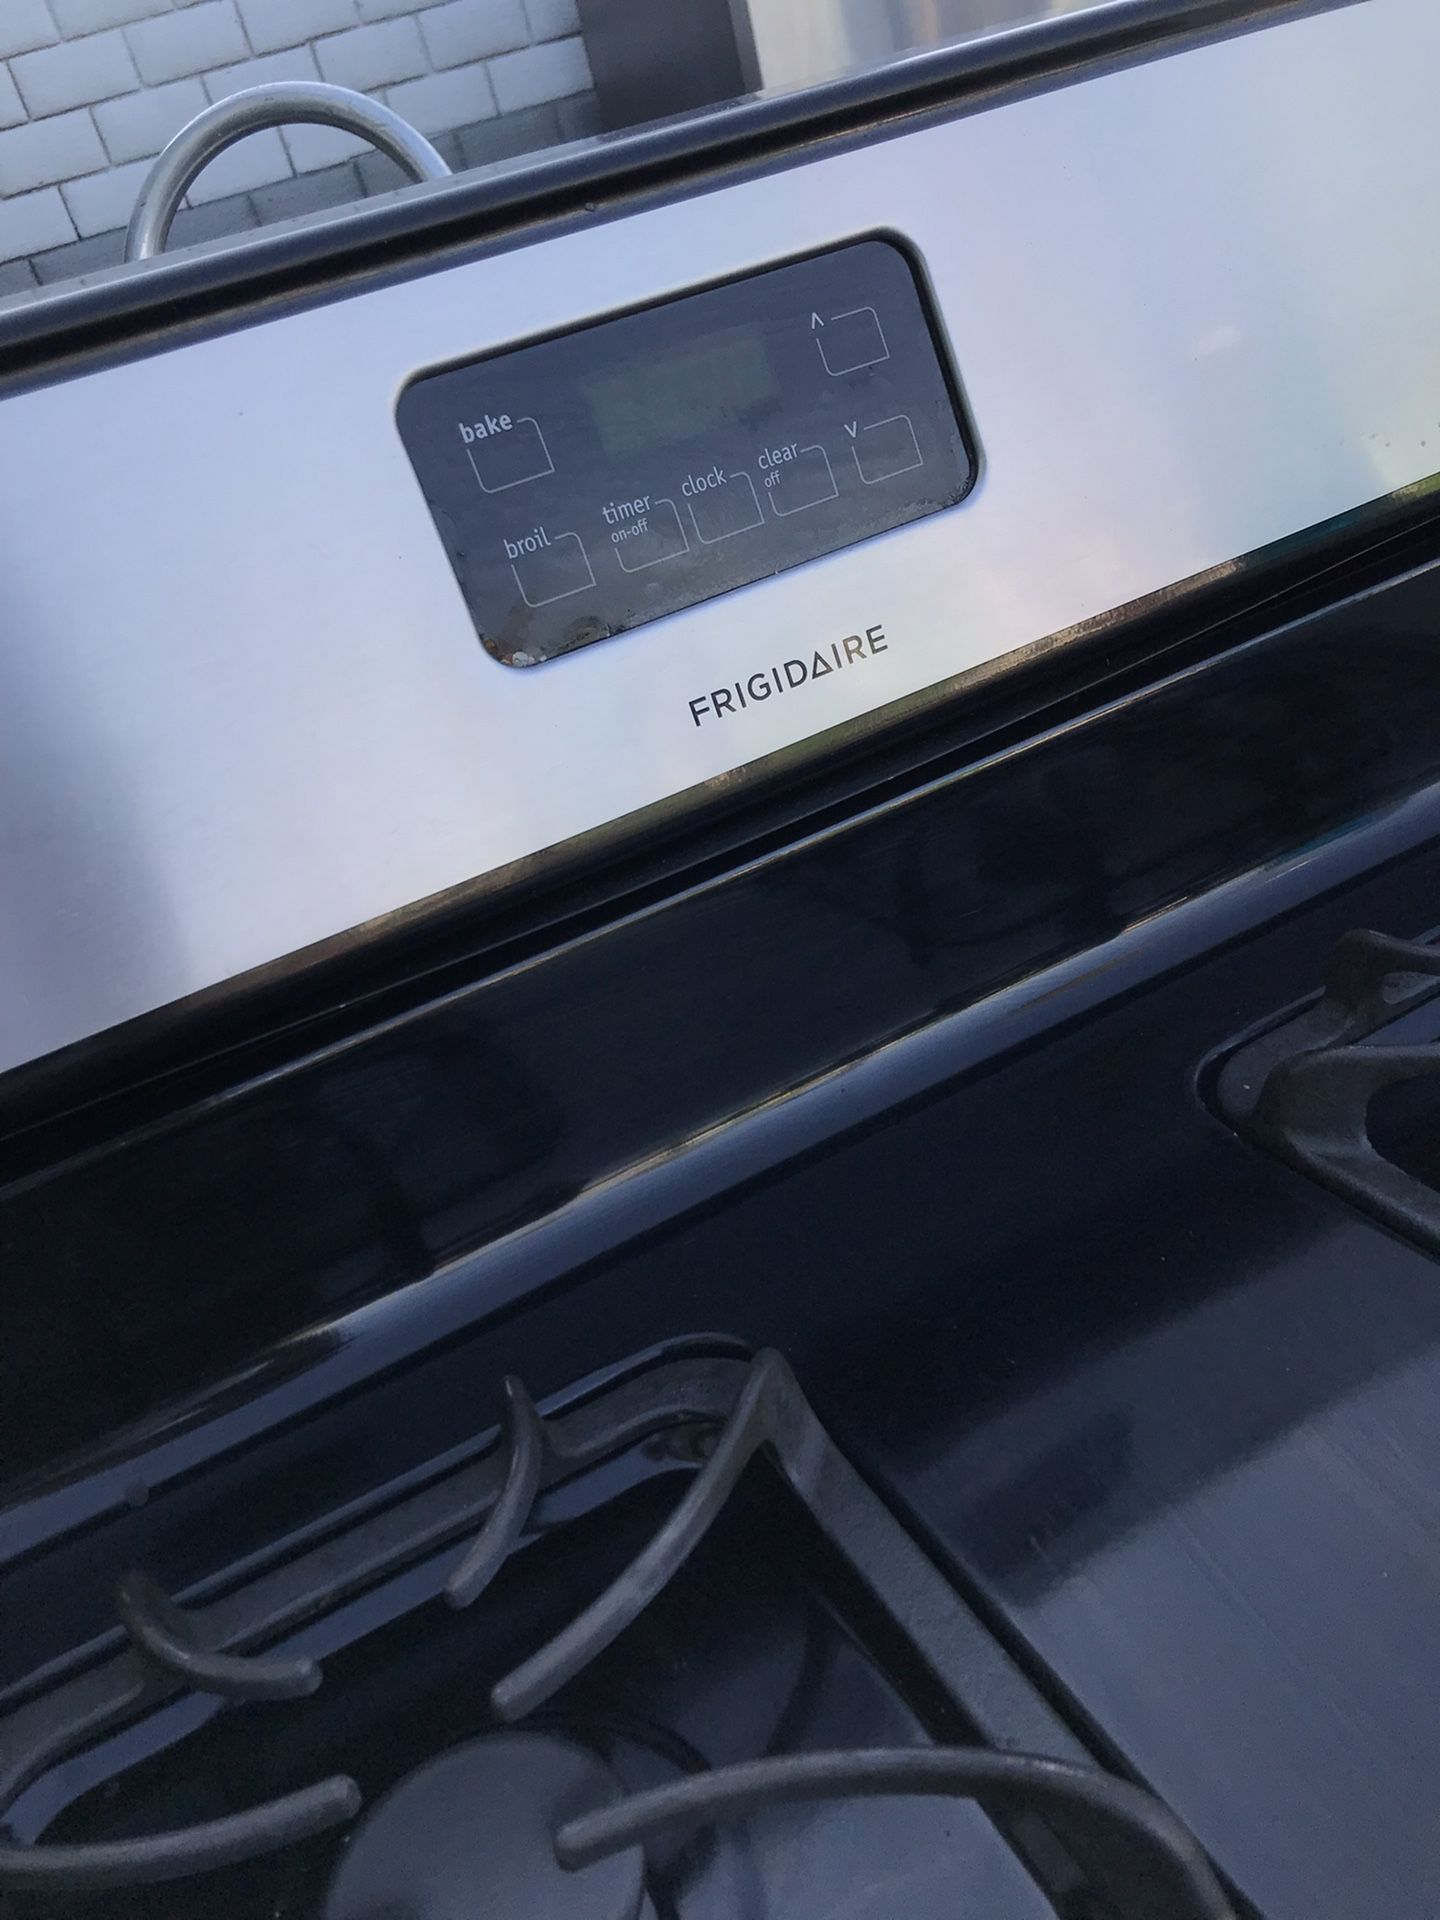 FRIGIDAIRE 4 BURNER GAS STOVE